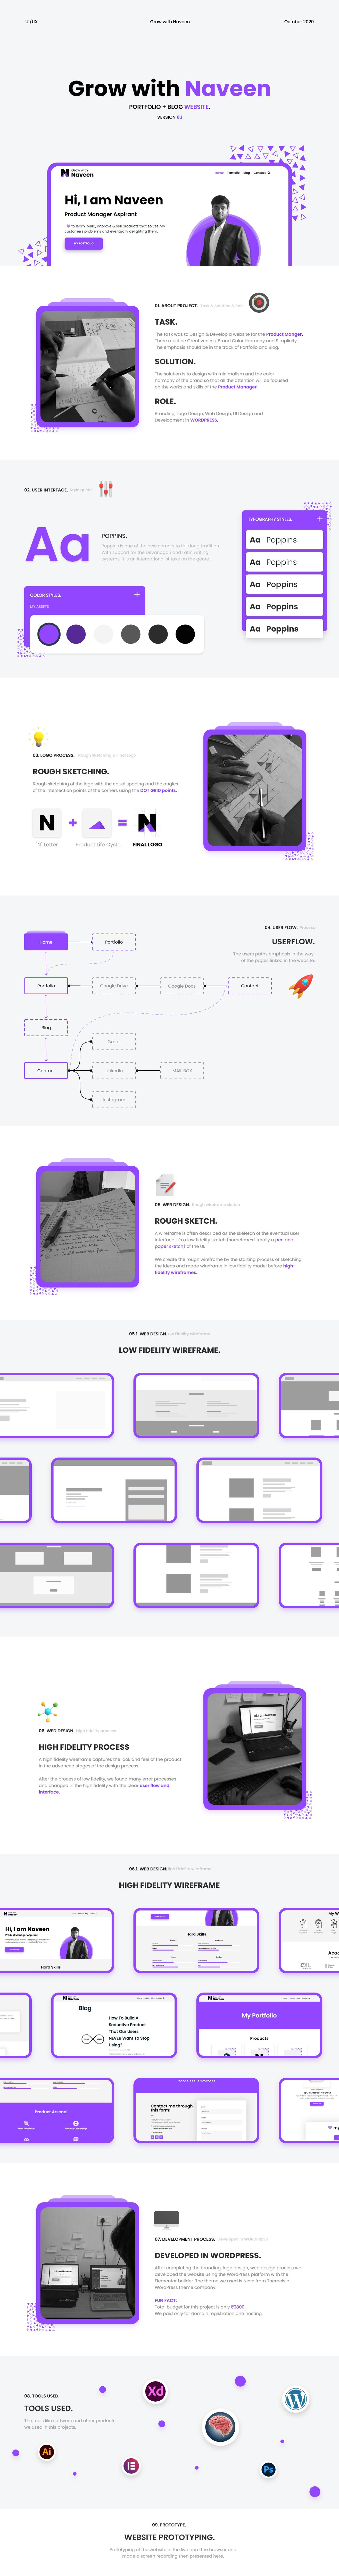 #portfoio branding  logo manager portfoliowebsite product productmanger Webdesign Website wordpress